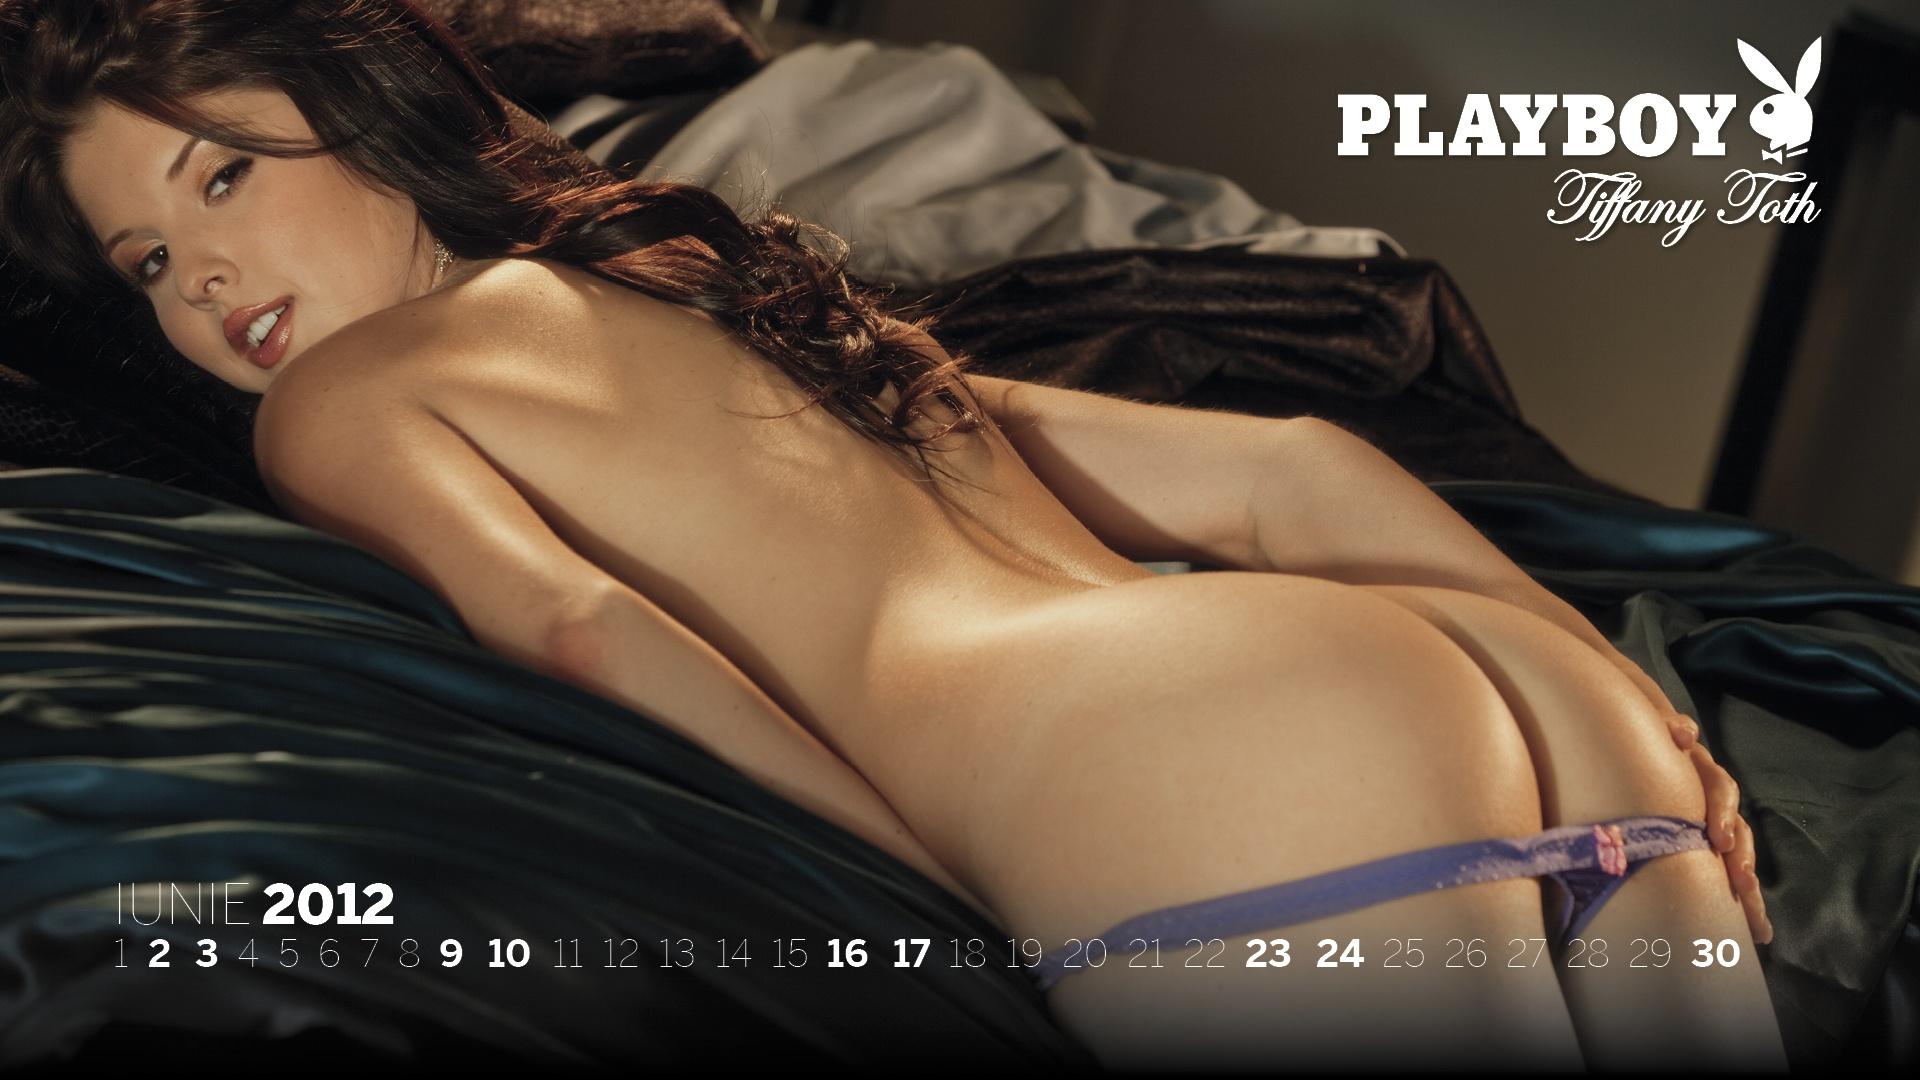 Tiffany Darwish Playboy Pictorial Photos Wizbang Pop!